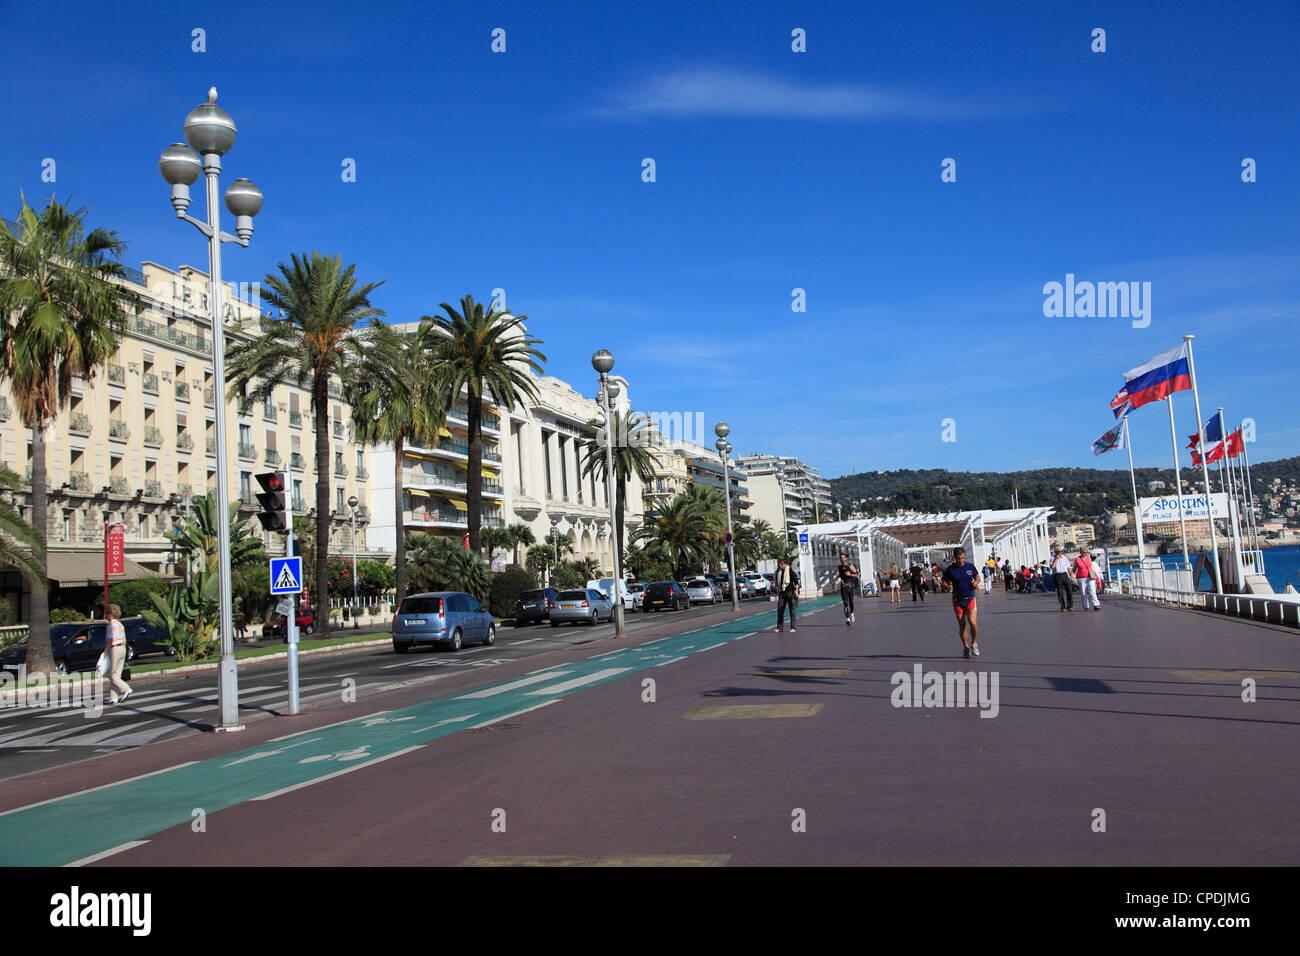 Promenade des Anglais, Nizza, Alpes Maritimes, Cote d'Azur, Riviera Francese, Provence, Francia Immagini Stock